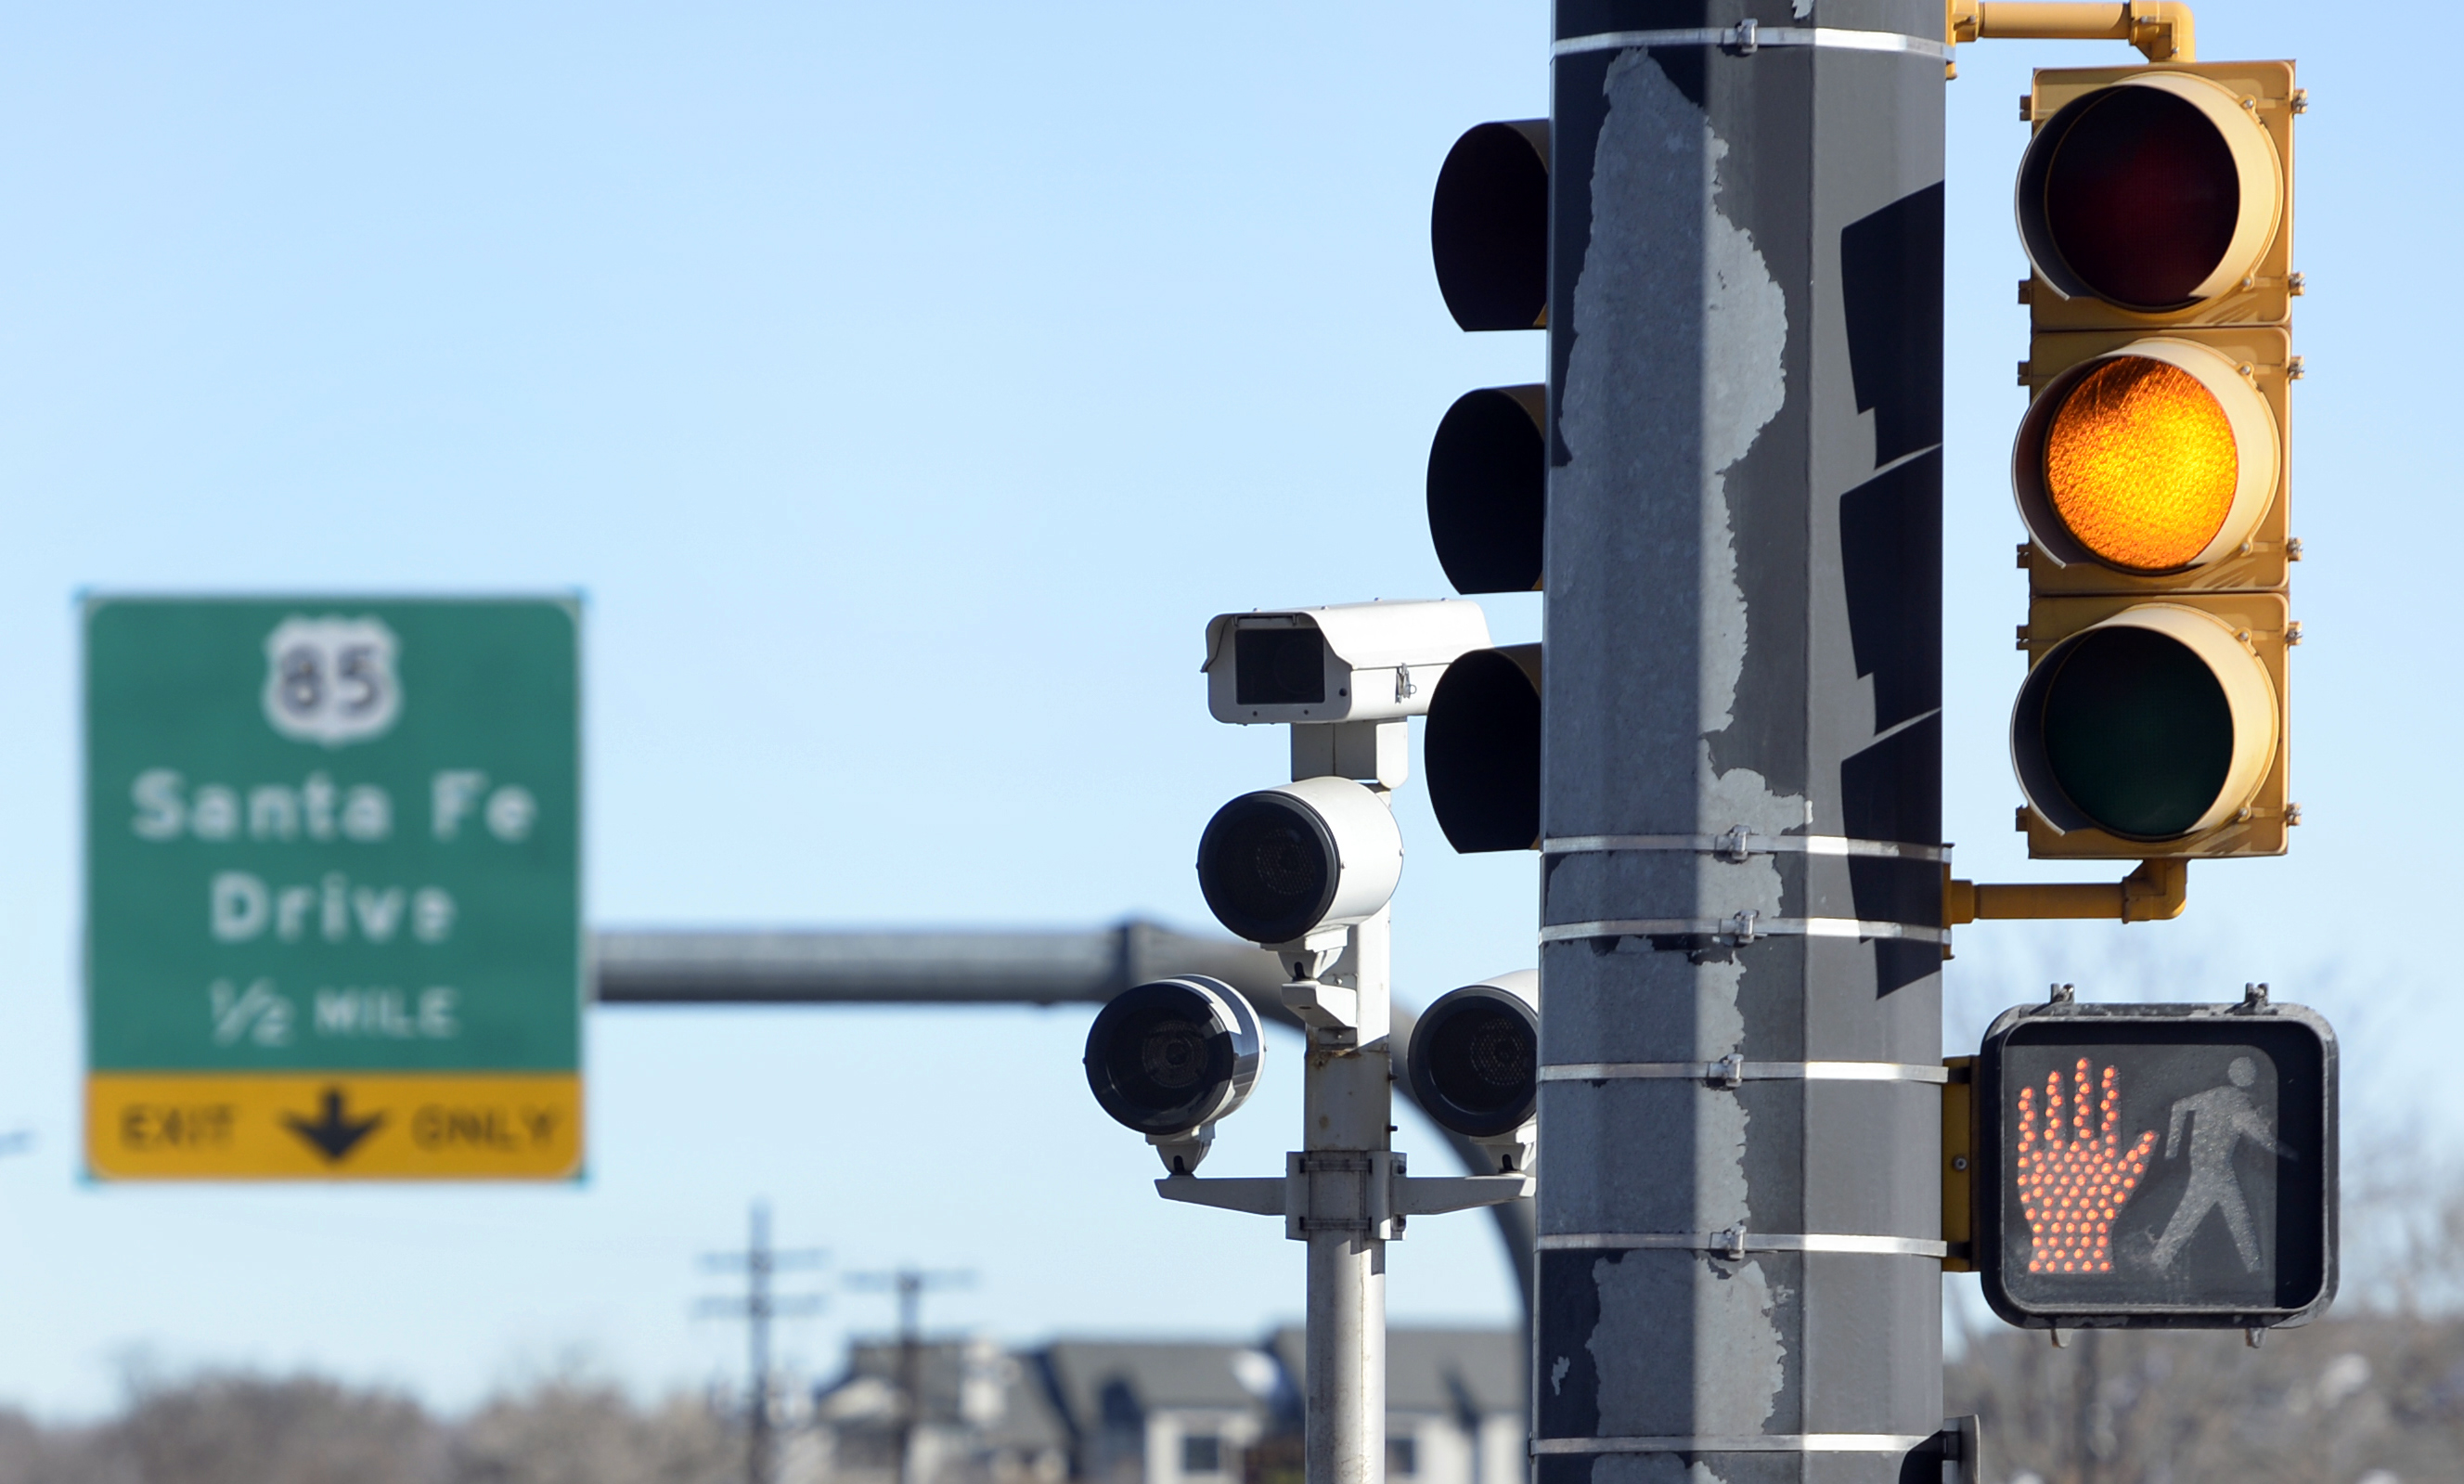 ... Light Camera Programs The Truth Courtesy Ci Santa Maria Ca Us Red Light  Cameras Beat Ticket For Red Light Violations CA Traffic Tickets Receiving A  ...